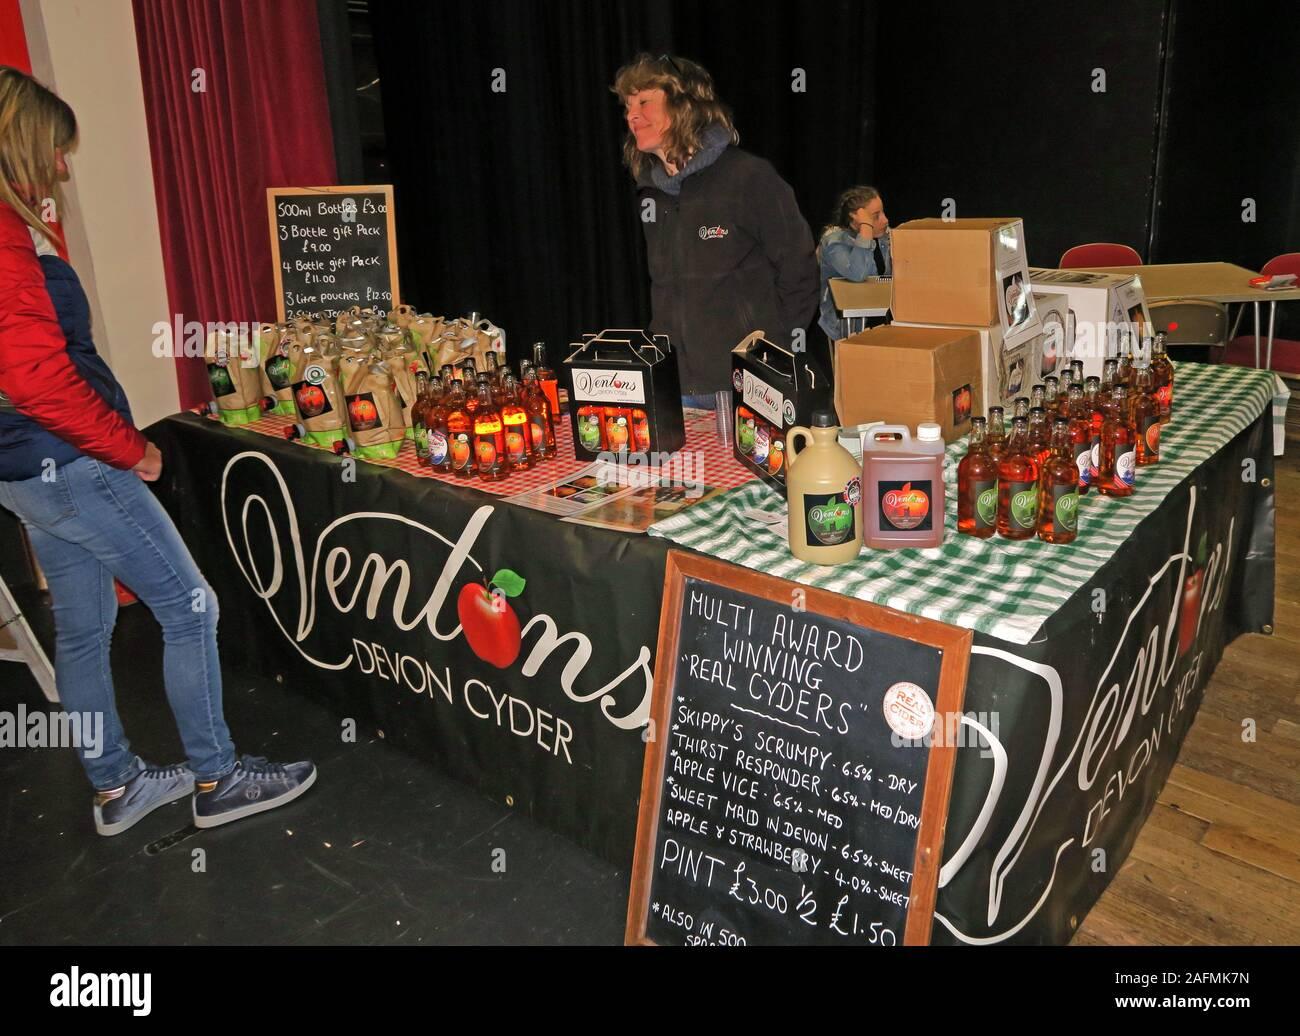 HotpixUK,@HotpixUK,GoTonySmith,Somerset,SDC,Sedgemoor,South West England,England,UK,South West,town,TA6,Food and Drink,festival,cider,food stalls,stalls,drink stalls,tastings,organic,Bridgwater town hall,townhall,venue,Bridgwater Town Team,Ventons Devon Cyder,Mark,Sharon Venton,Devon Cyder,Clyst St Lawrence